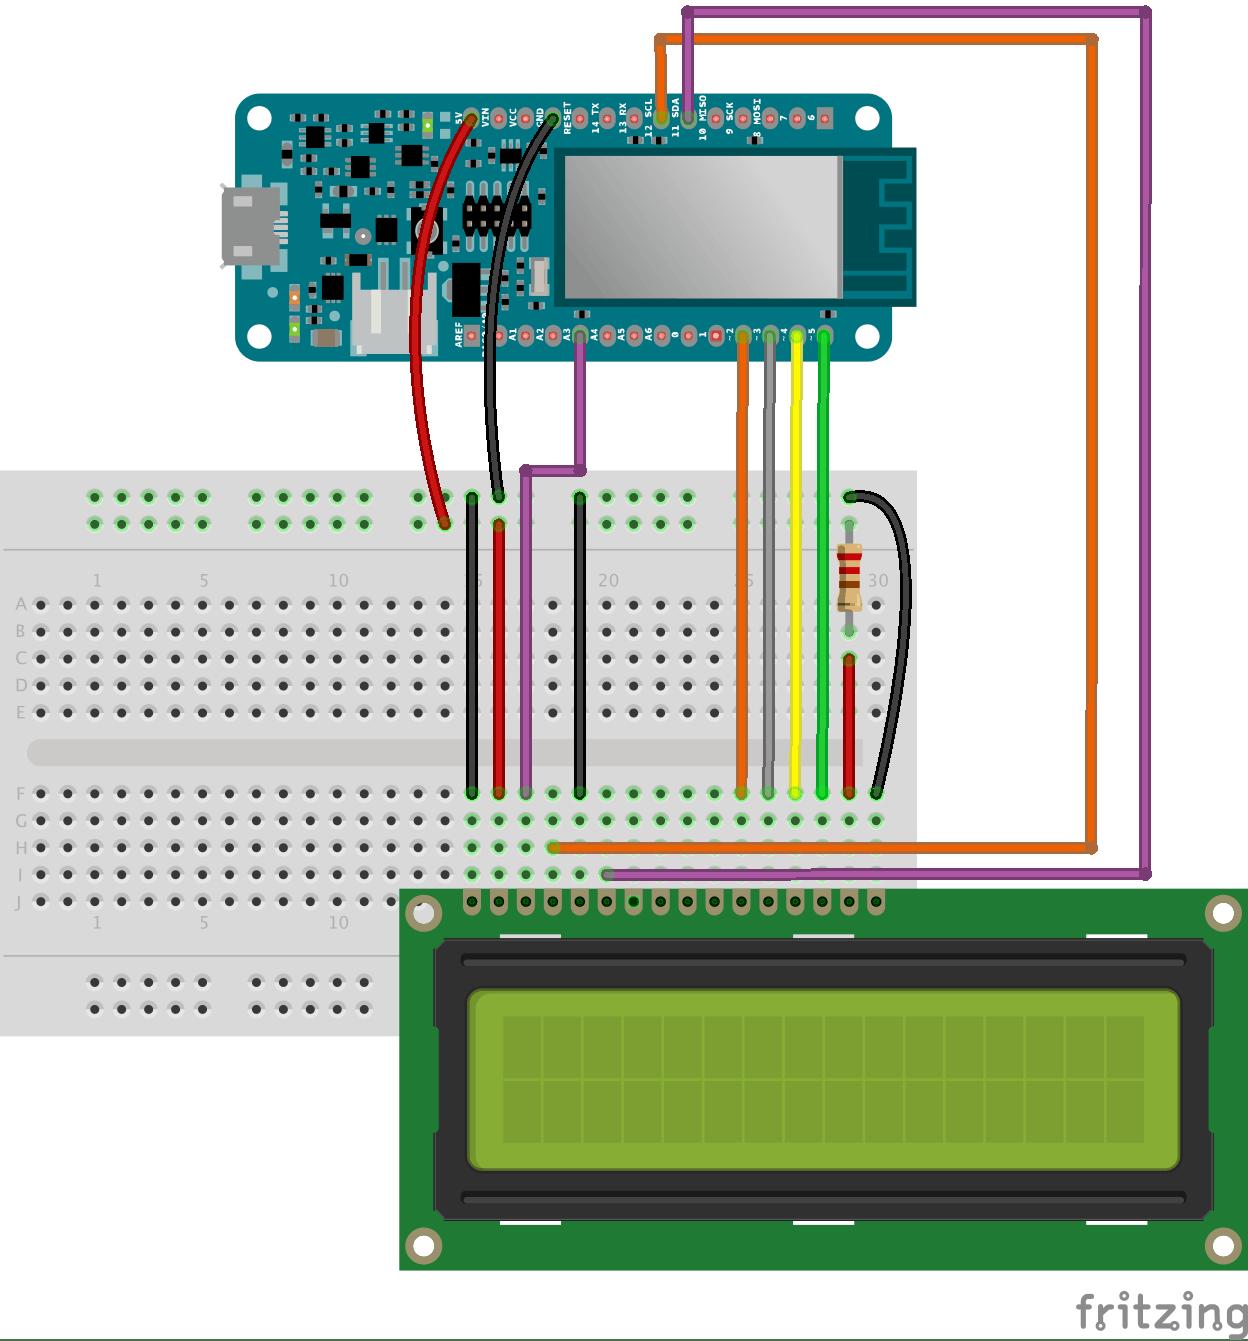 LCD Screen wiring